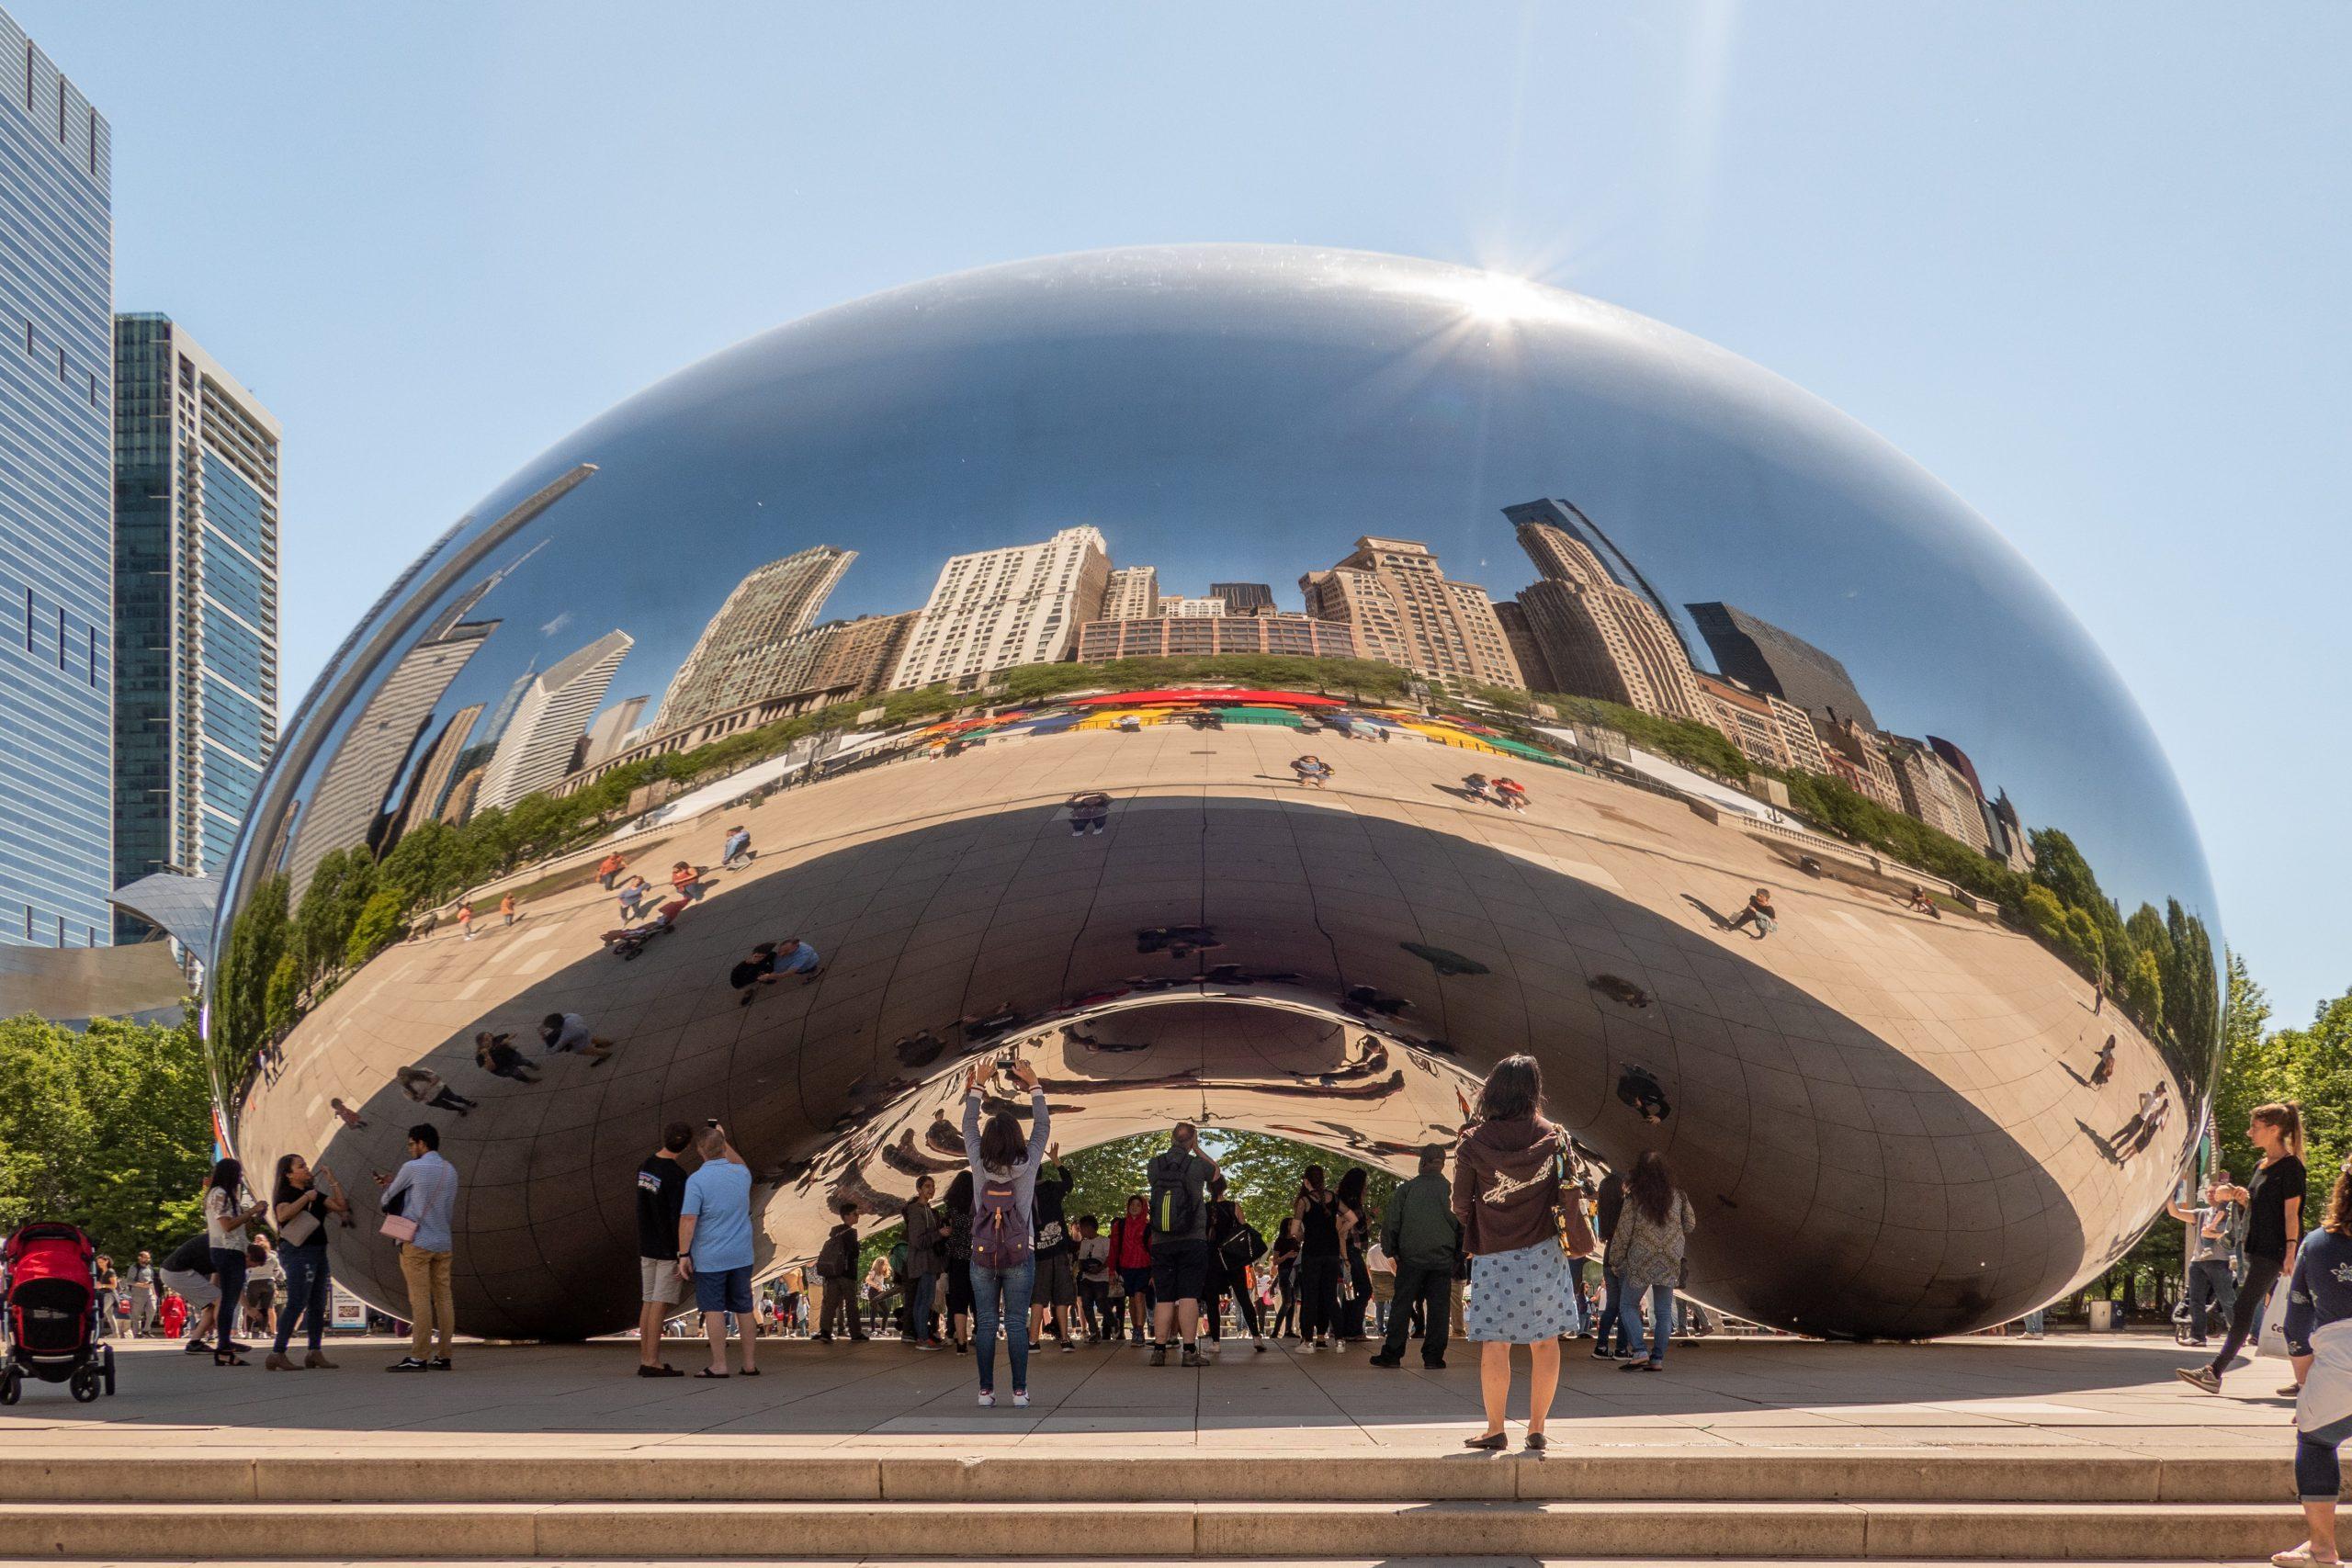 Chicagoan